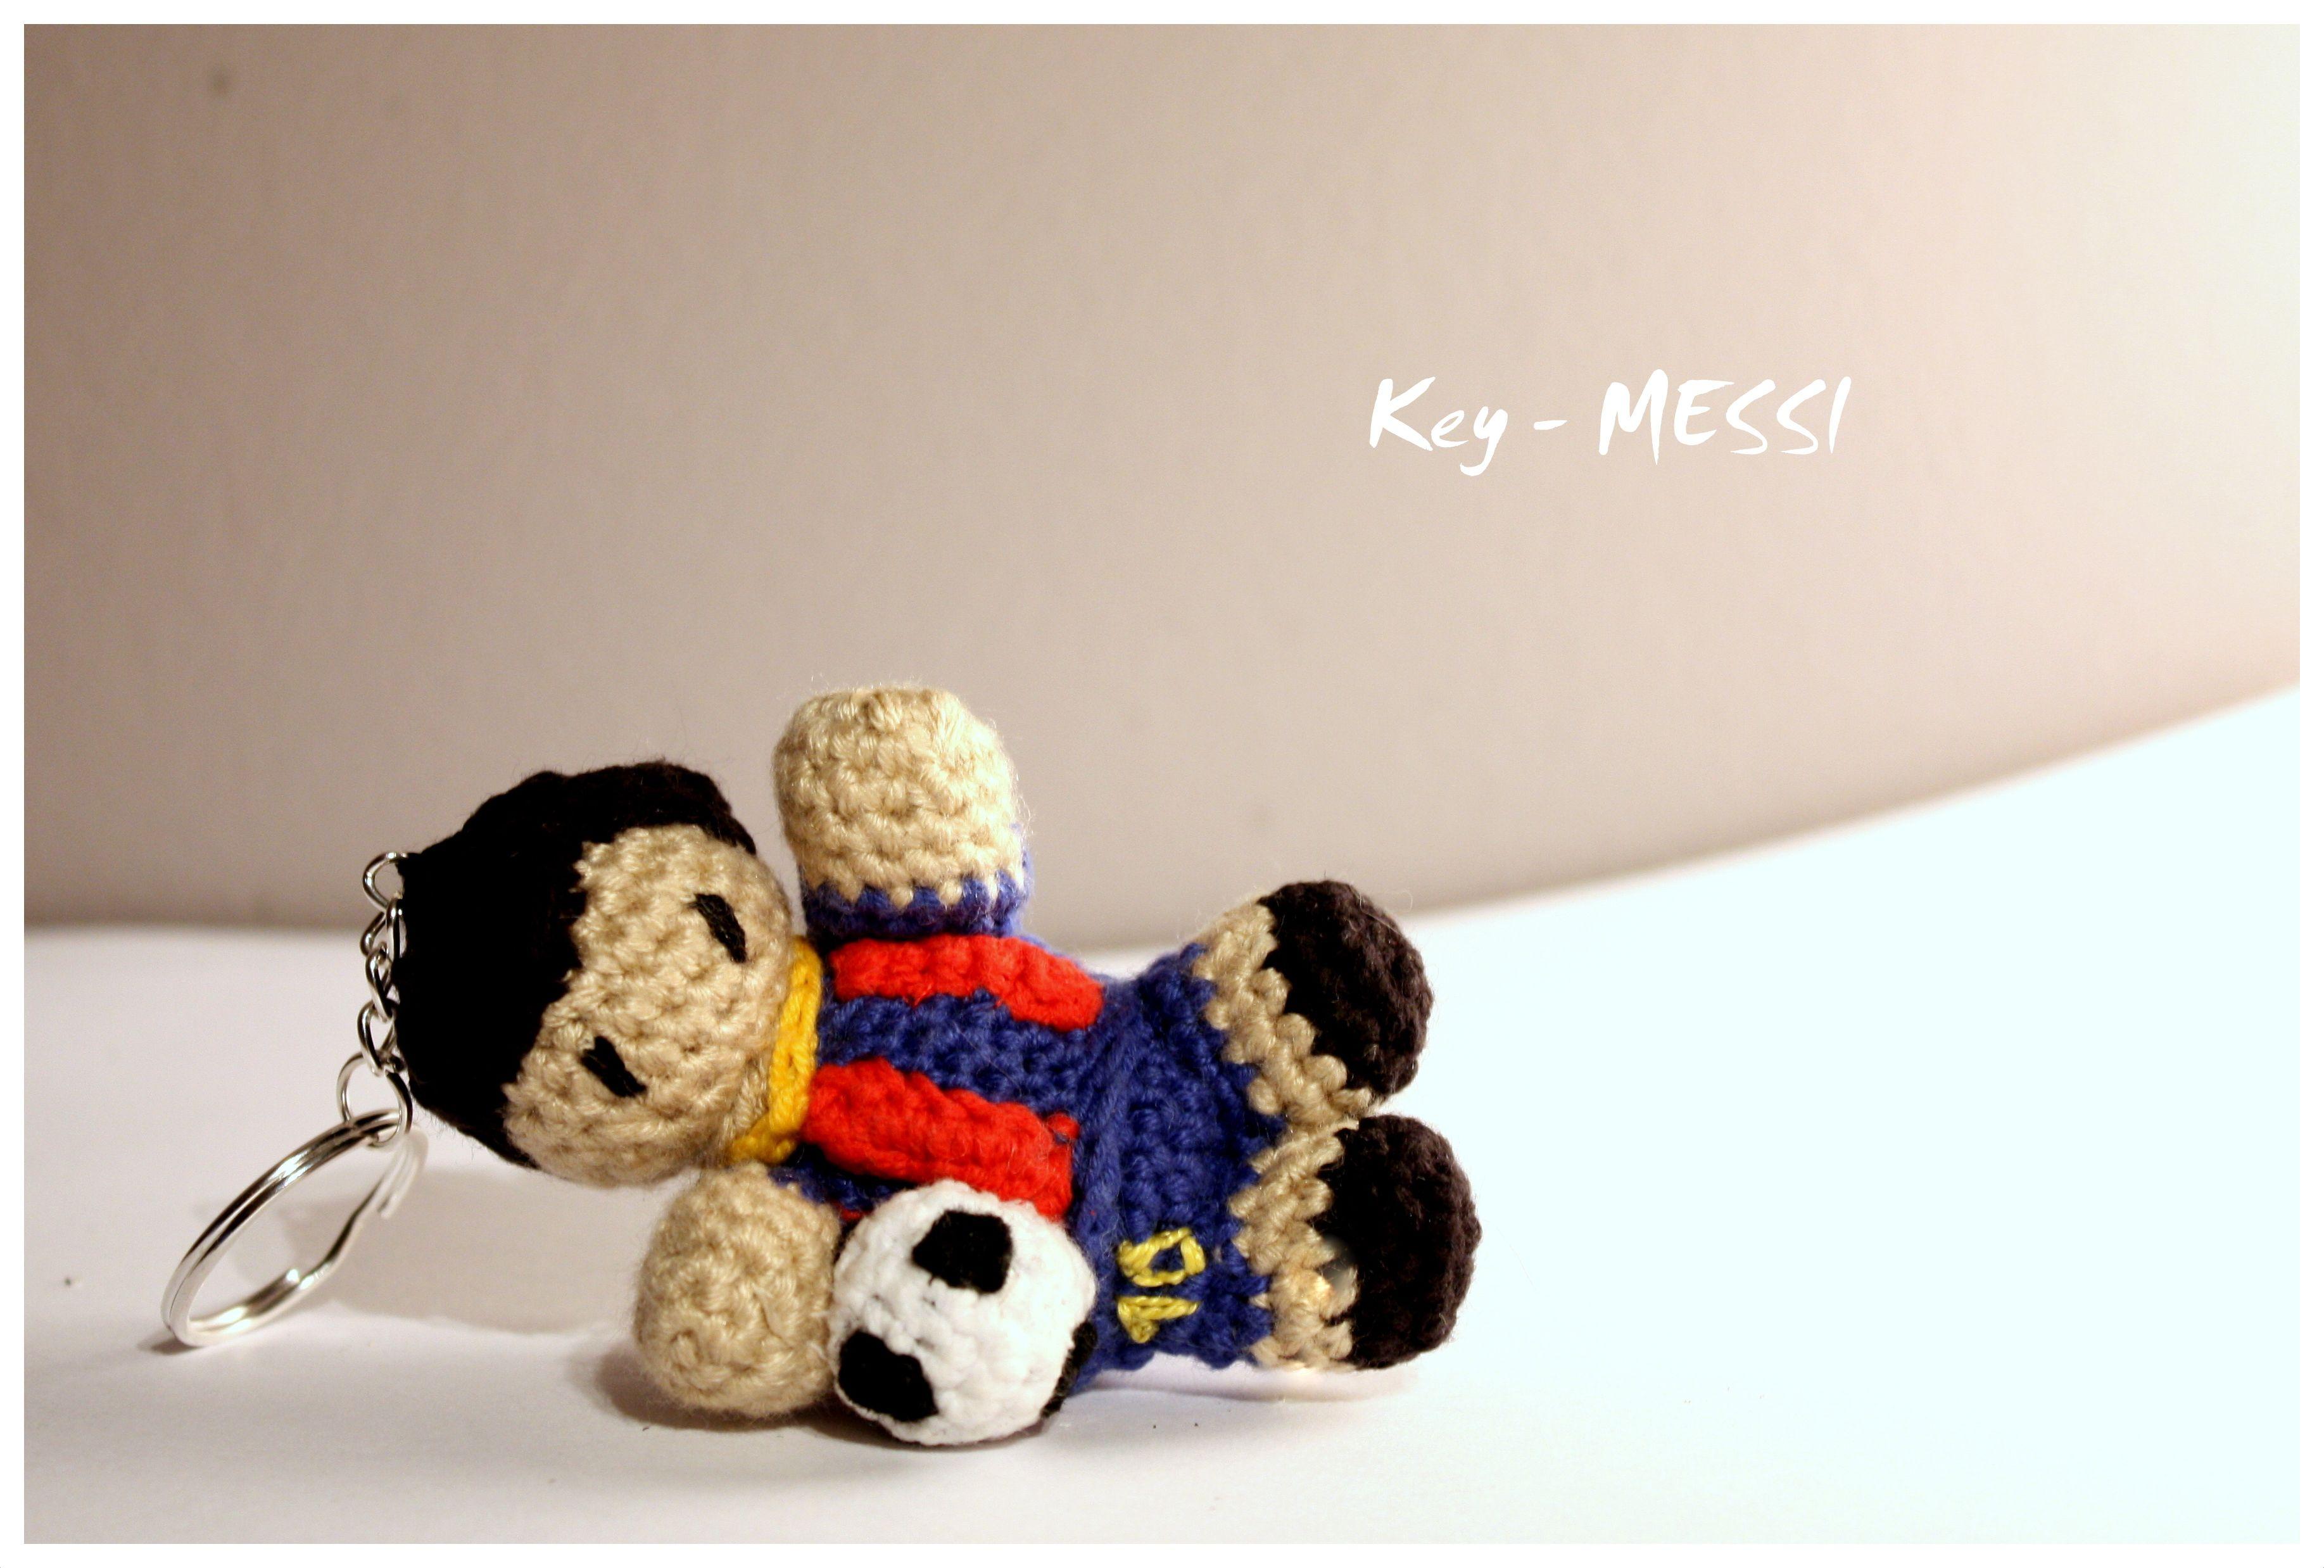 Amigurumi Messi / Key - Messi #amigurumi #amigurumis #messi ...